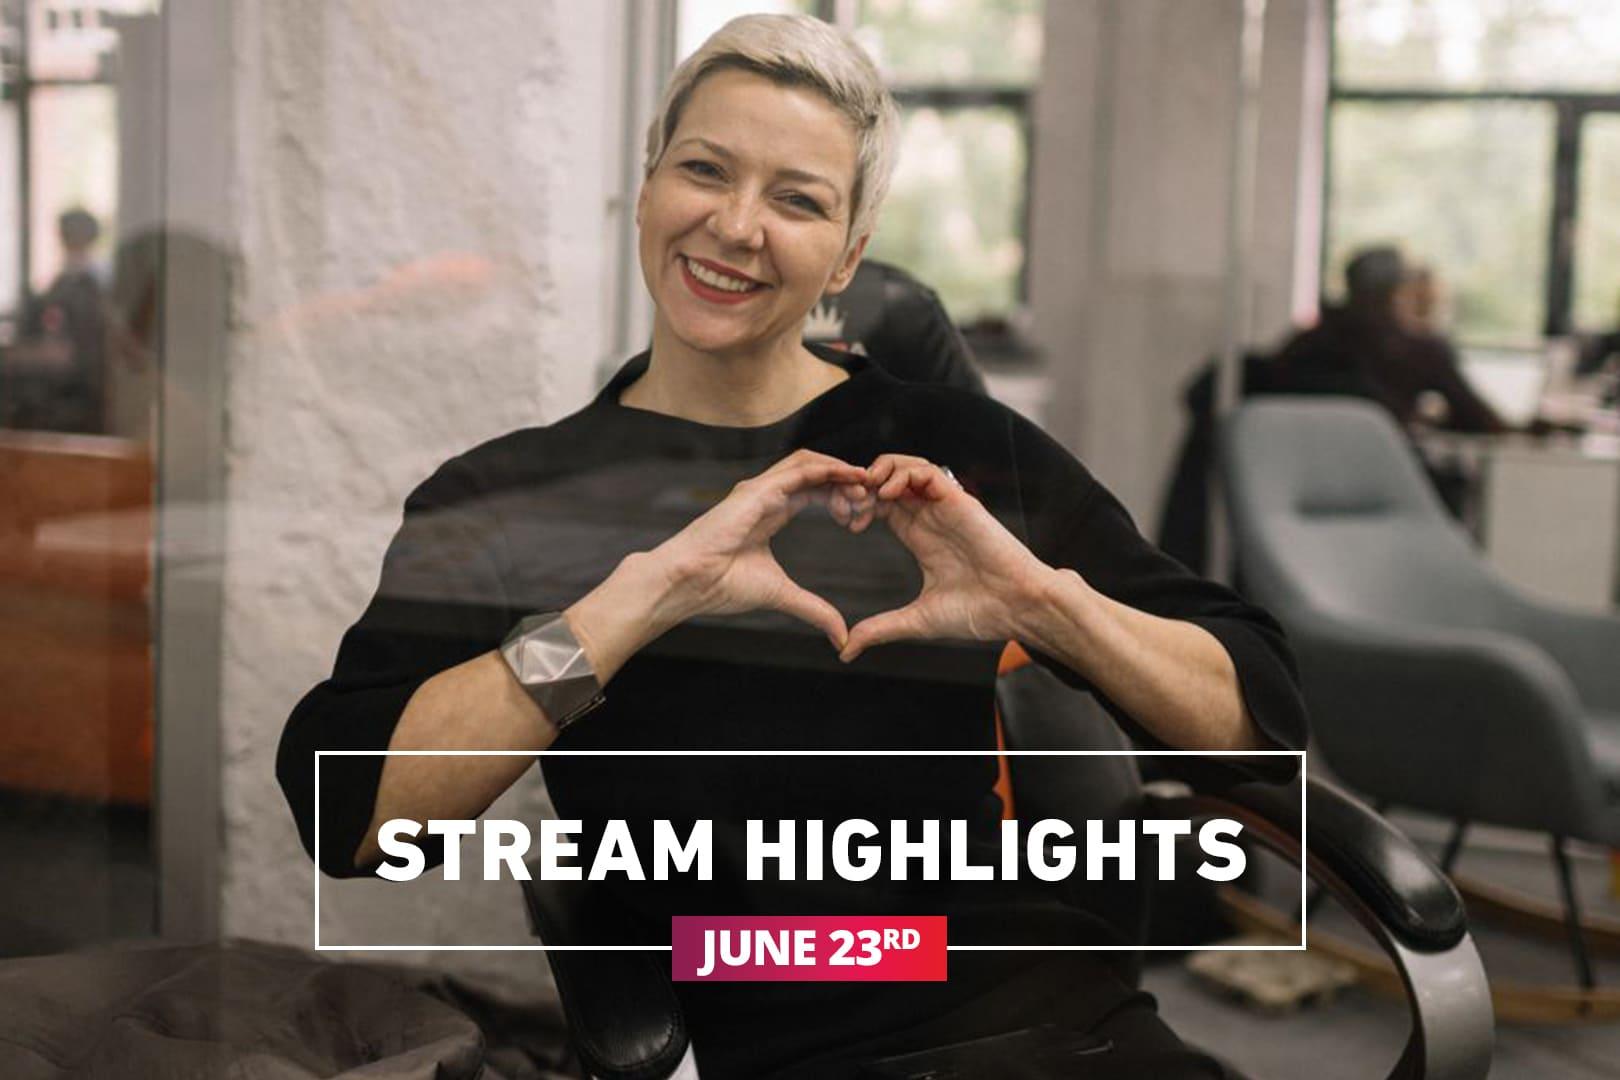 Stream highlights